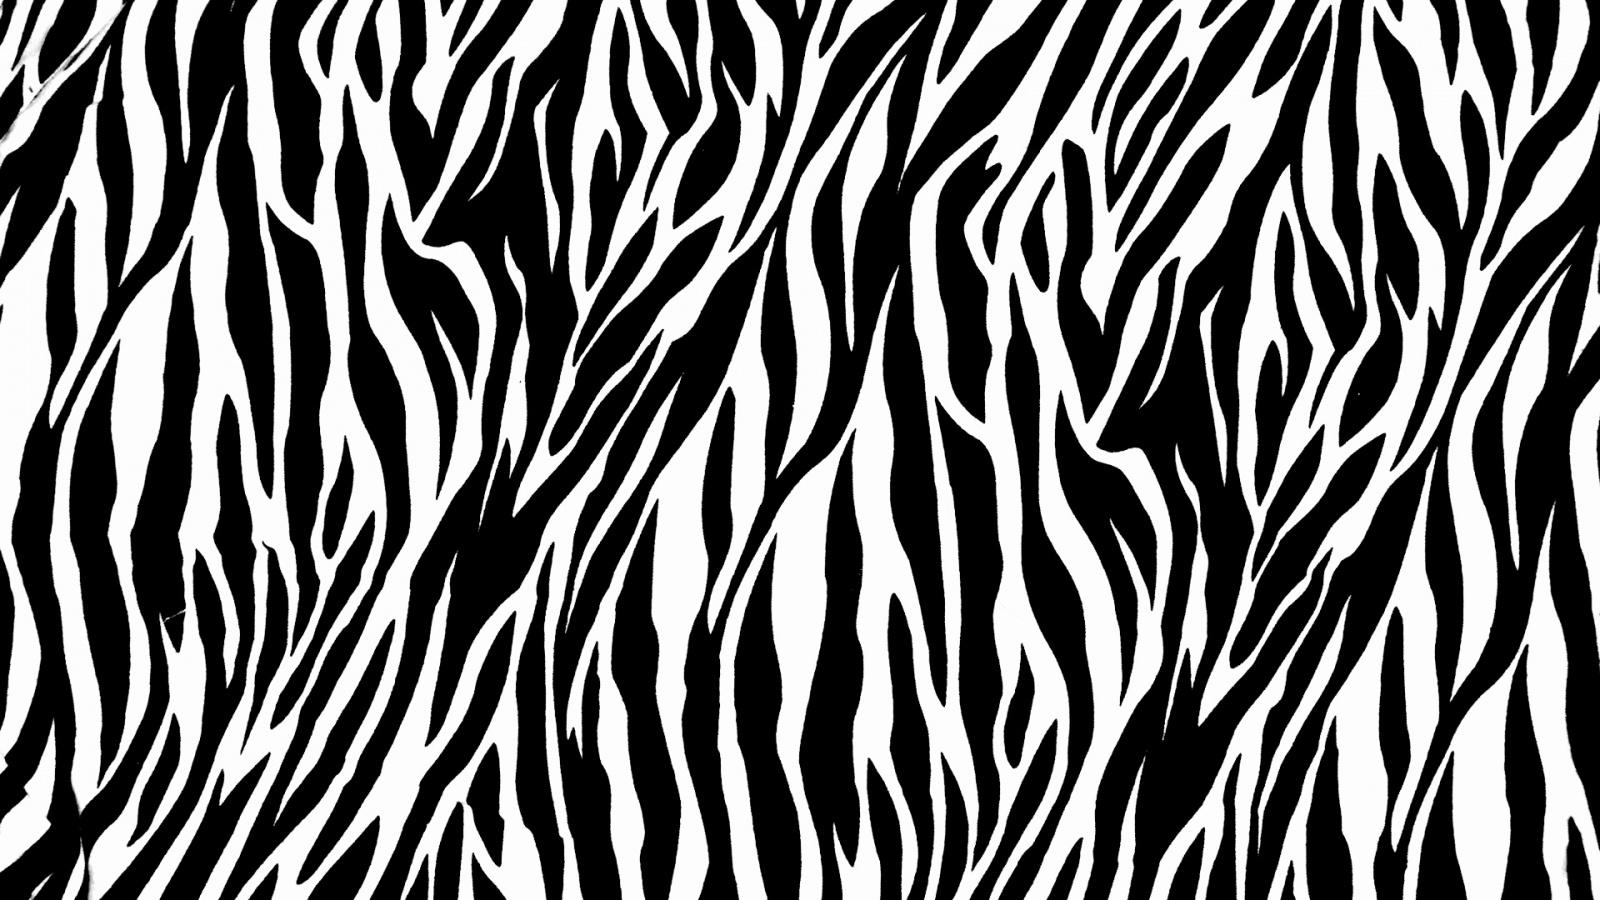 Zebra Print Wallpaper Wallpaperkickcom 1600x900px